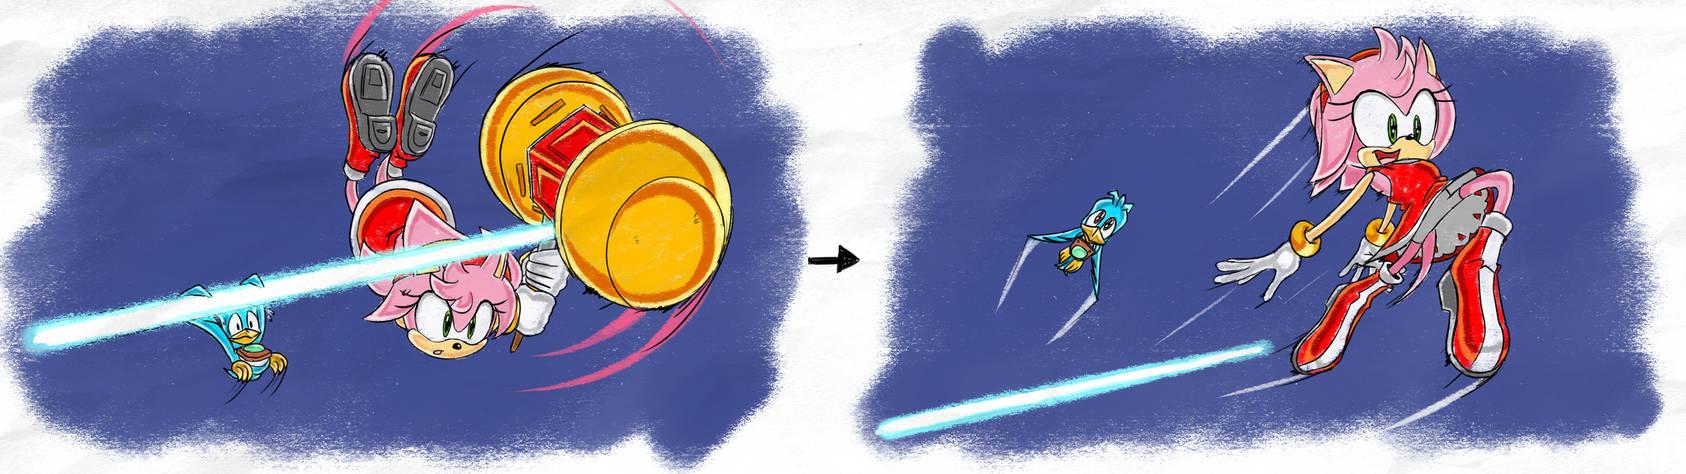 Amy Acrobatics - SA1 Remake Fan Concept Art